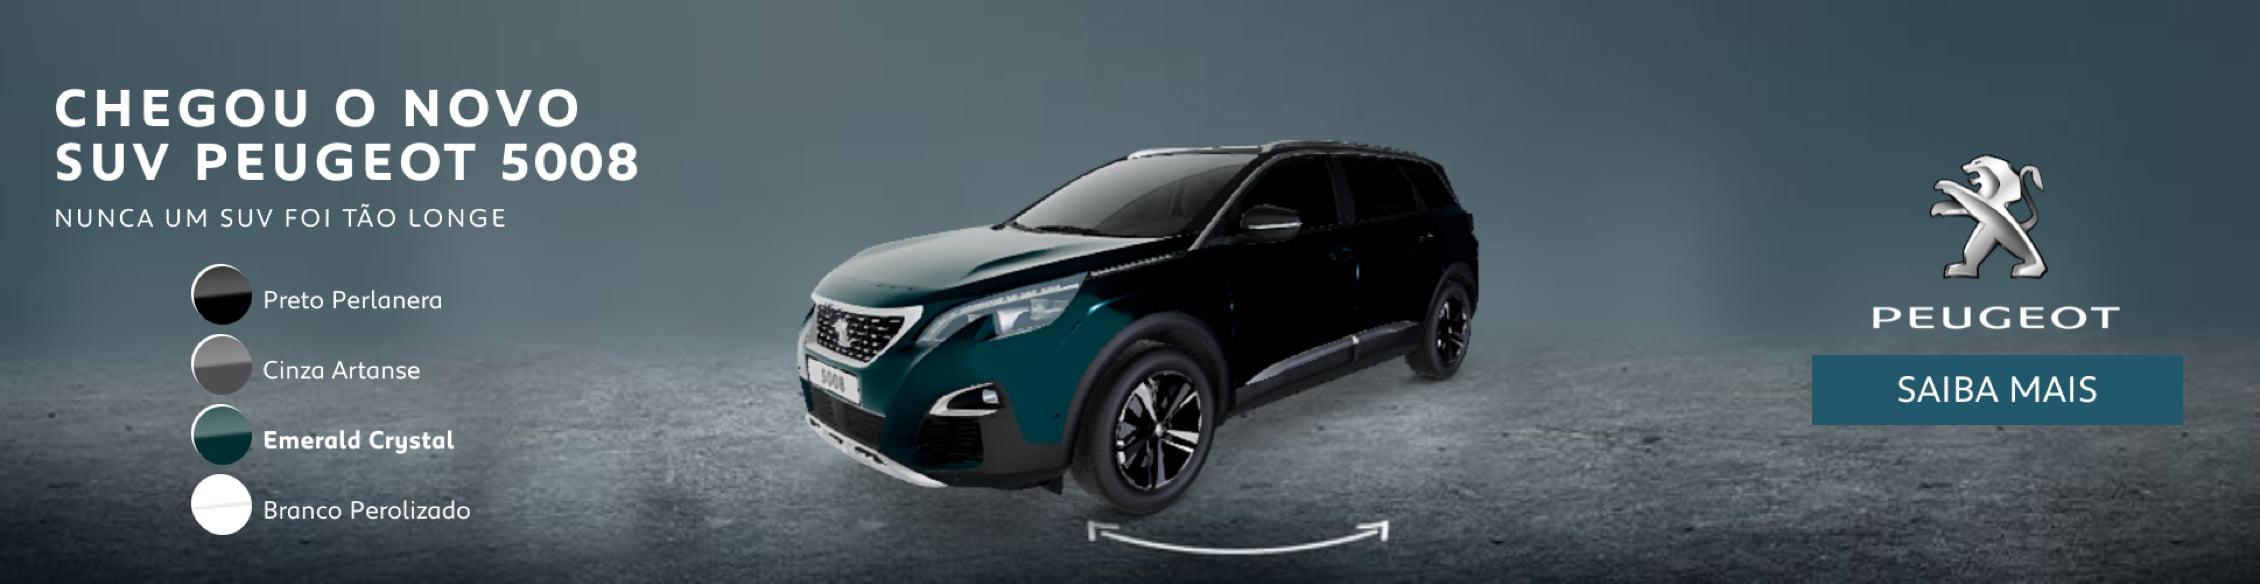 Peugeot's advertisement